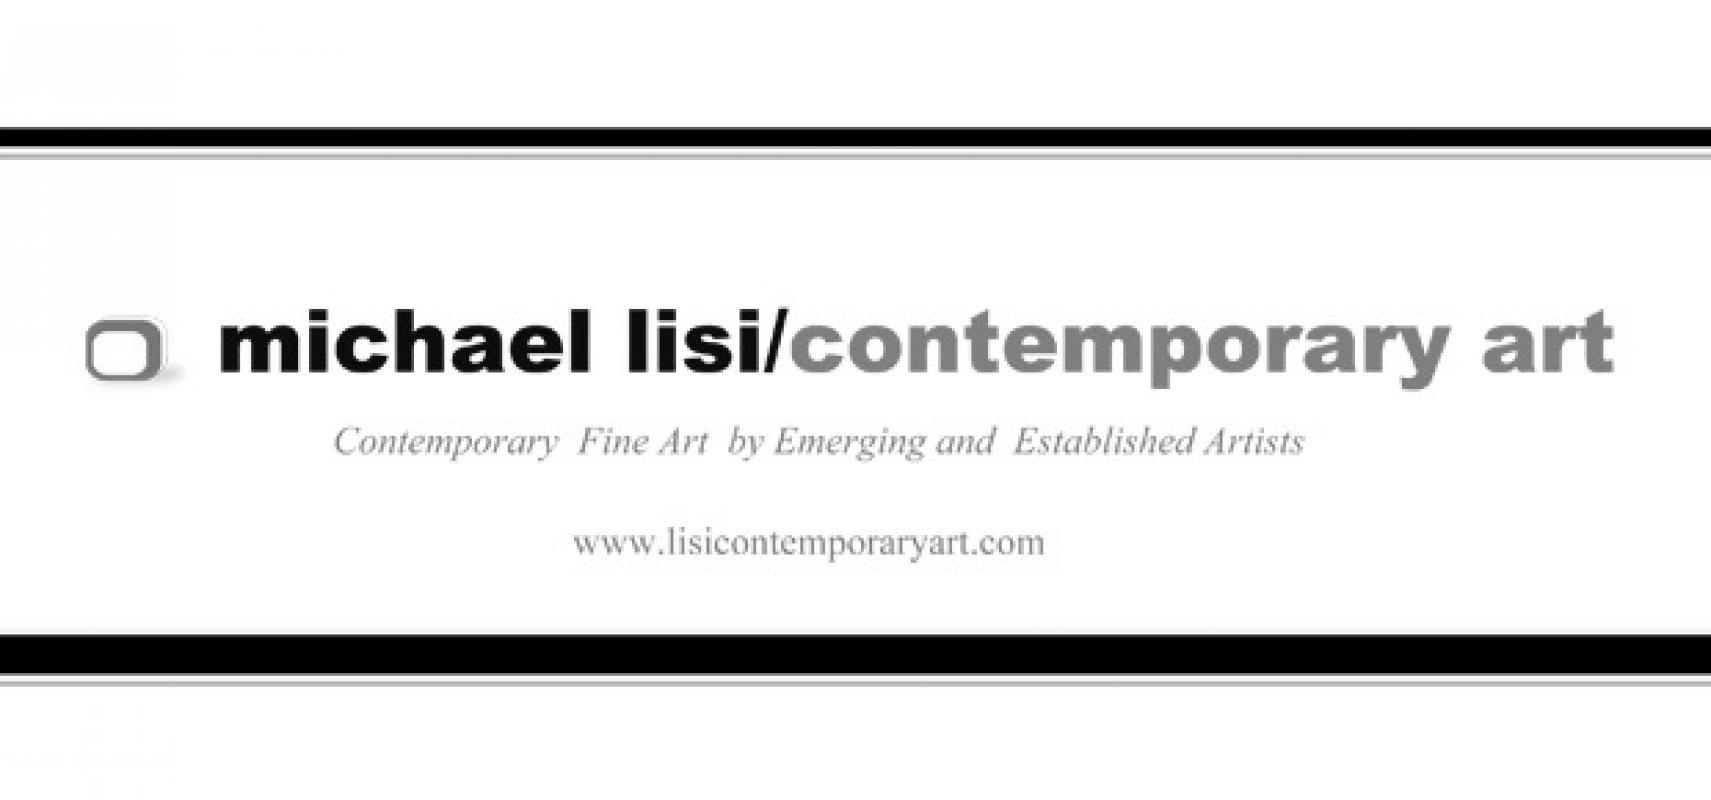 michael lisi/contemporary art